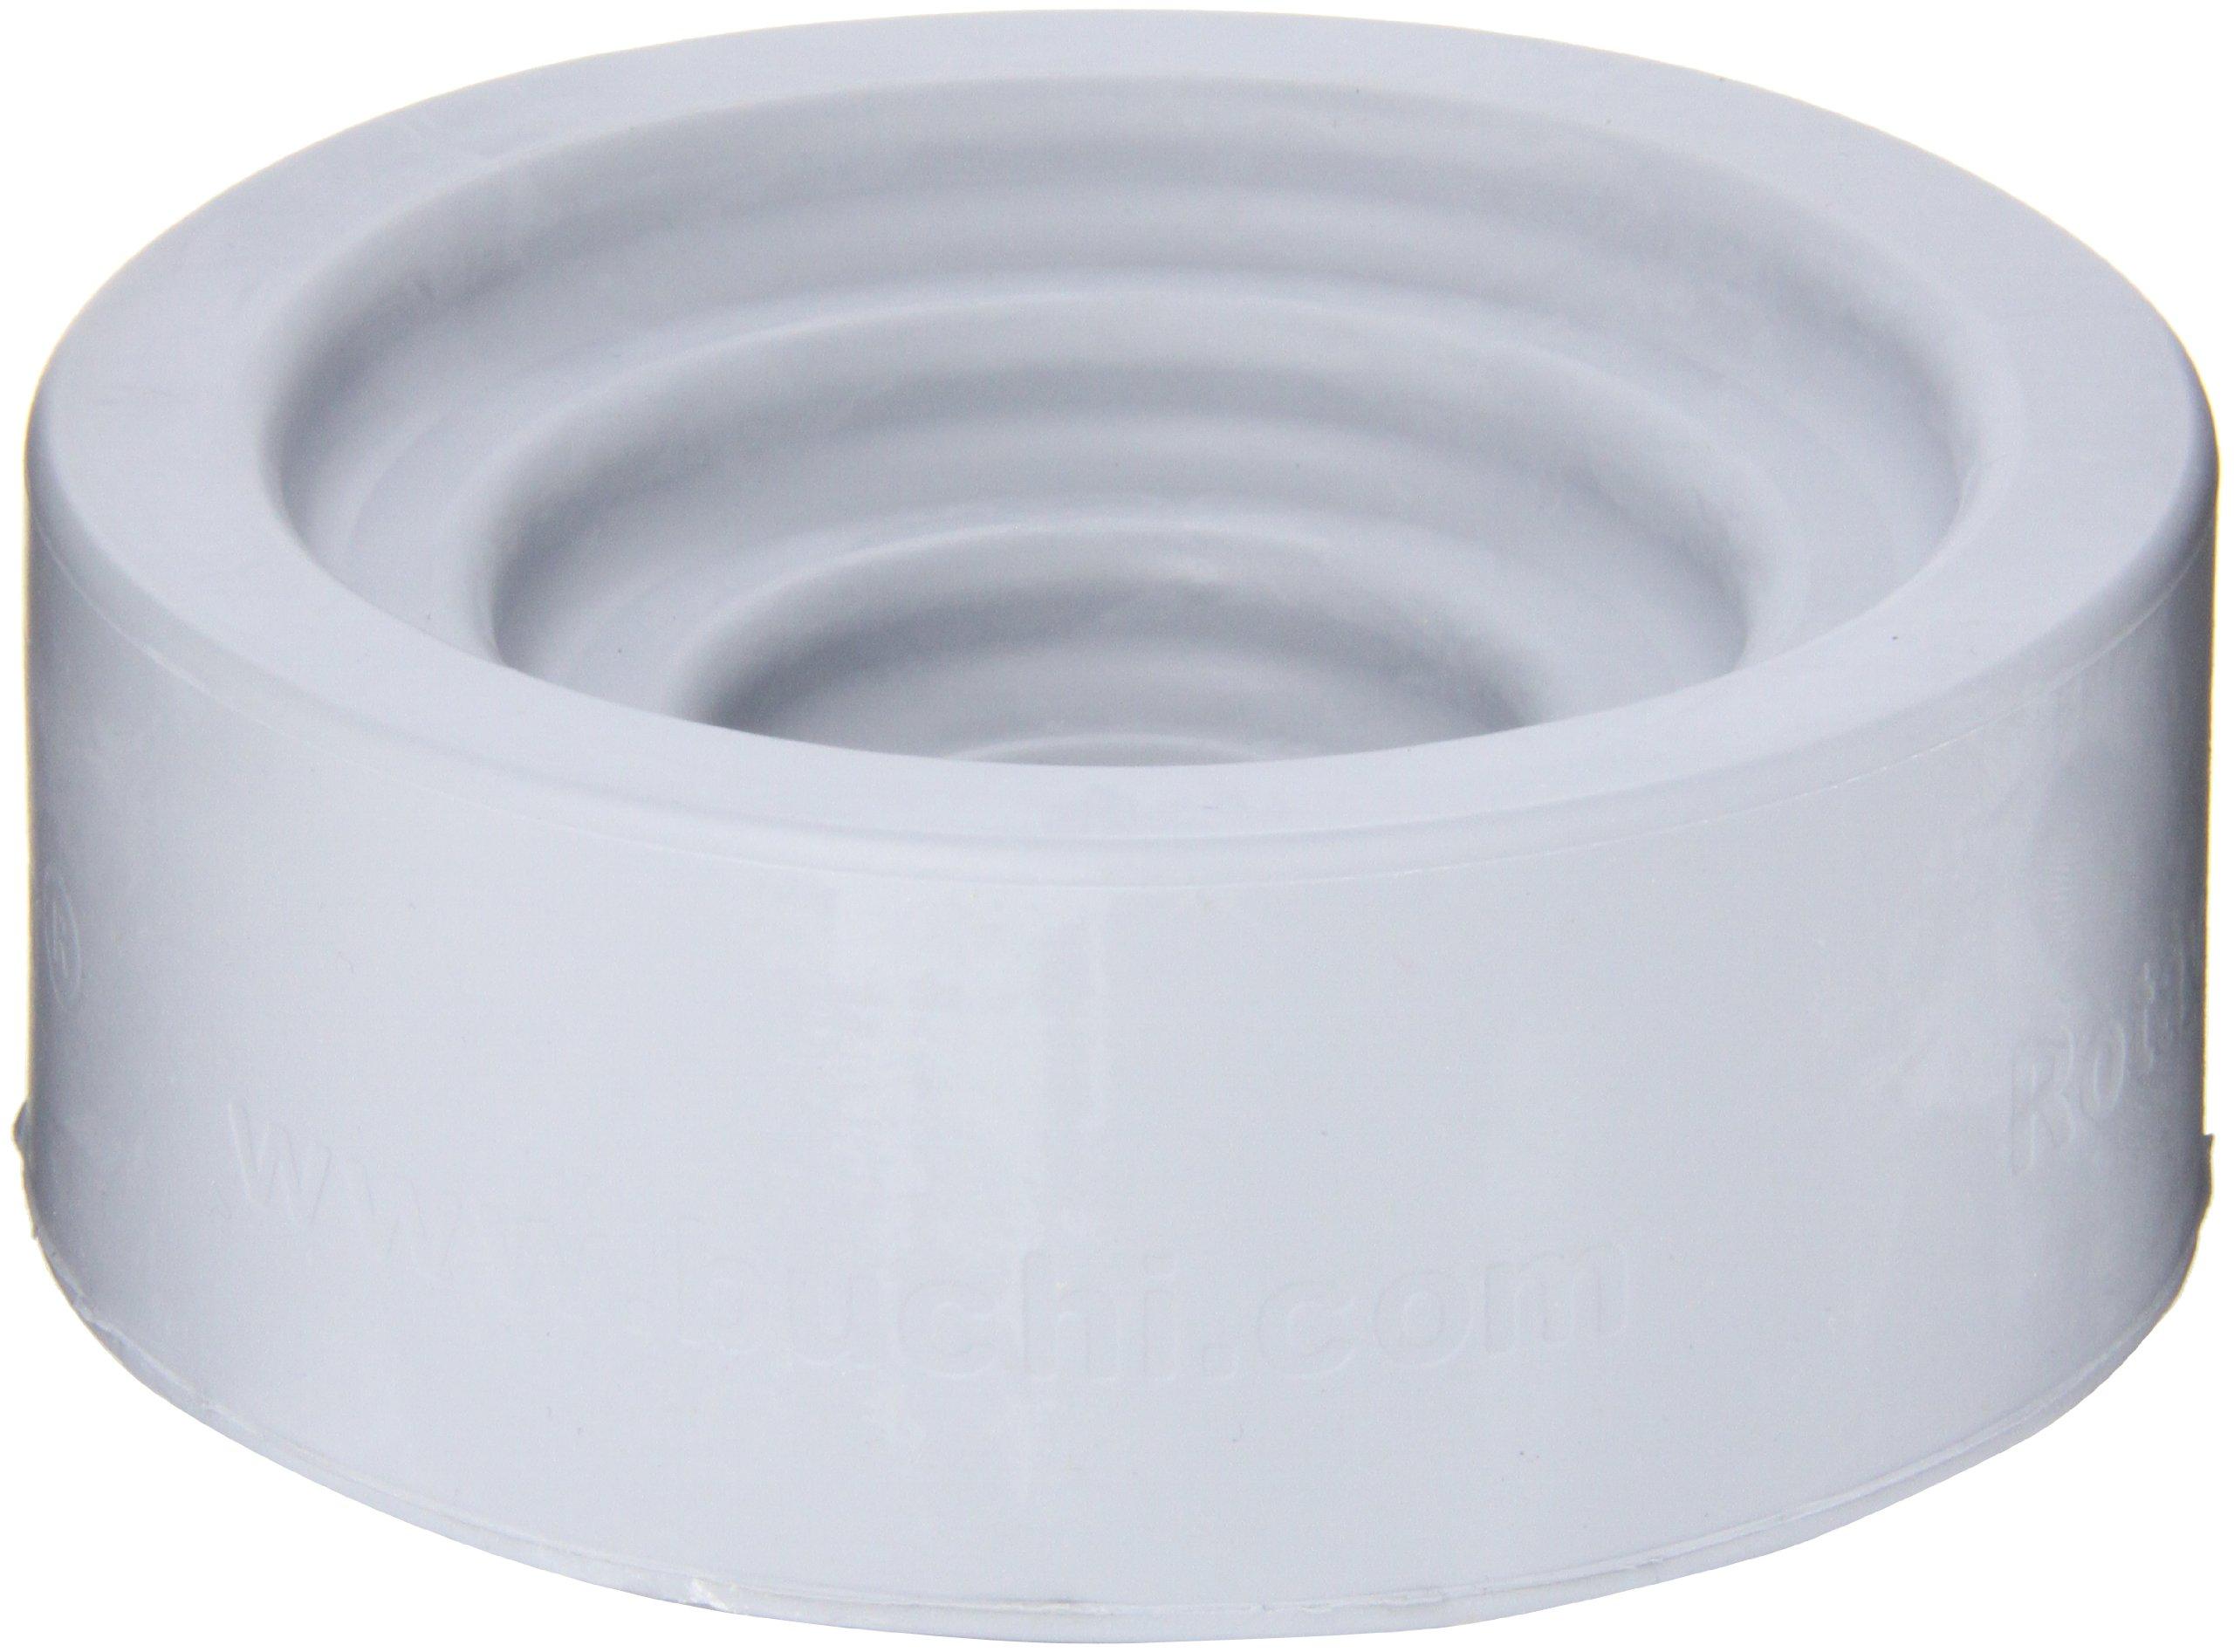 Buchi Rotavapor 048618 EPDM Non-Slipping Flask Holder Ring